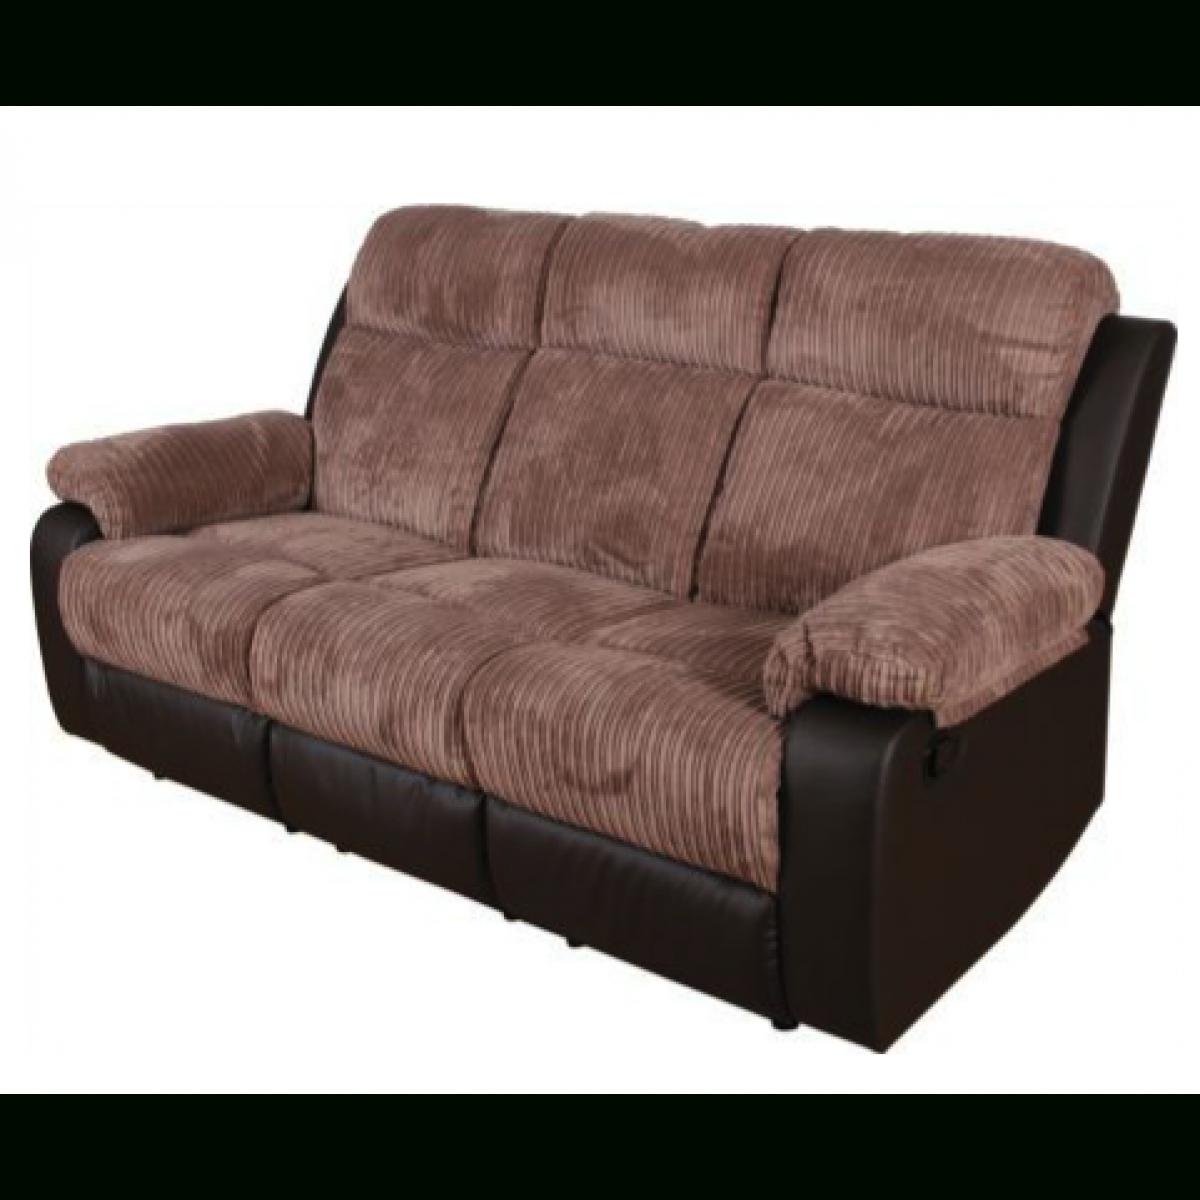 Bradley Large Fabric Recliner Sofa – Natural (View 10 of 10)